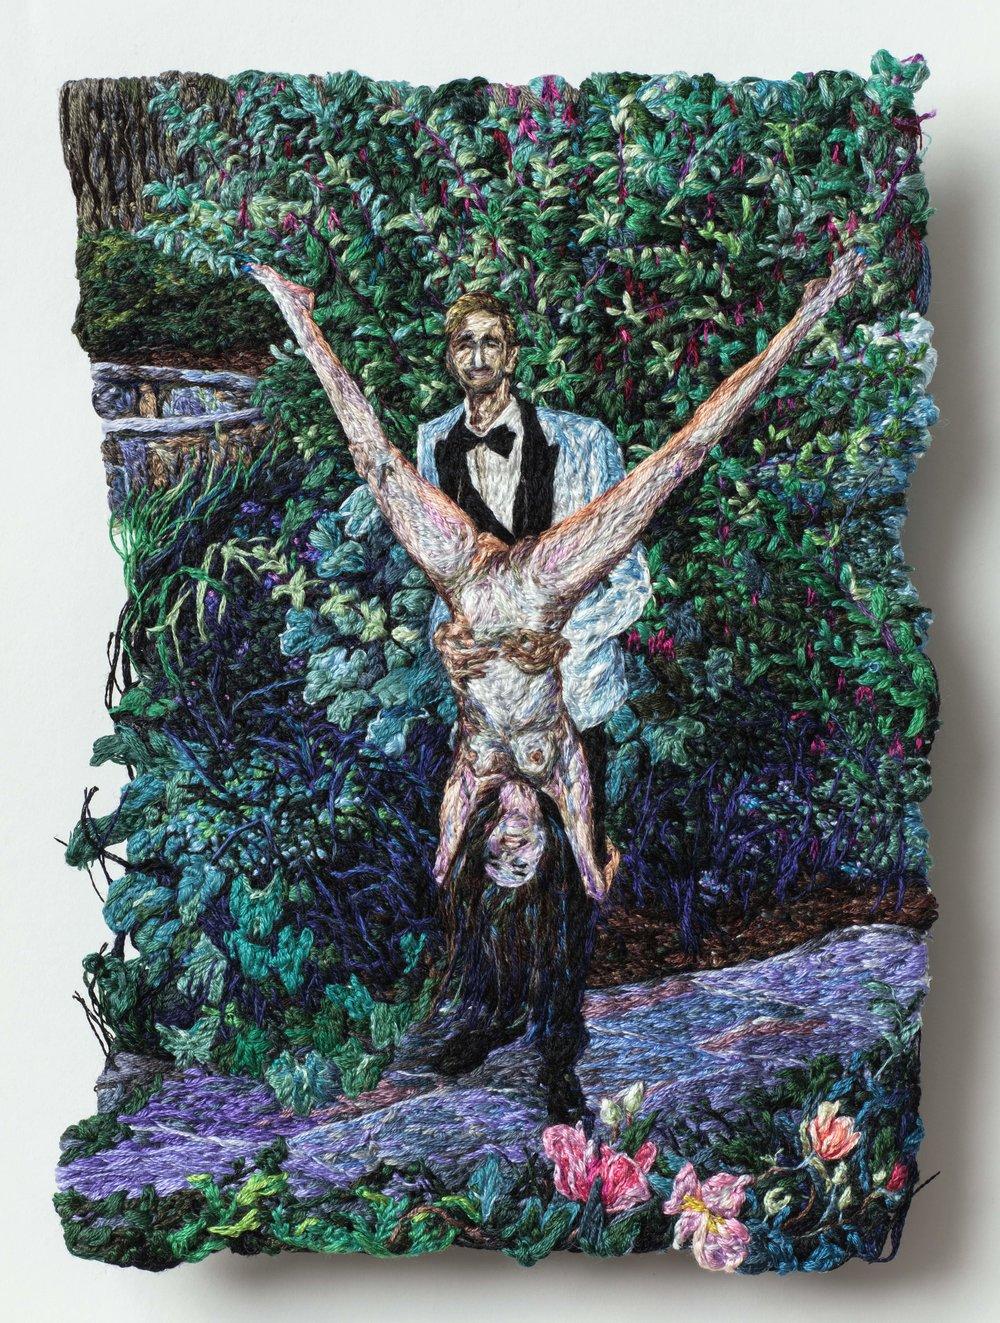 Grin, Sophia Narrett, 2019, Embroidery Thread, Fabric, 5.5 x 7.75 inches 2-min.jpg